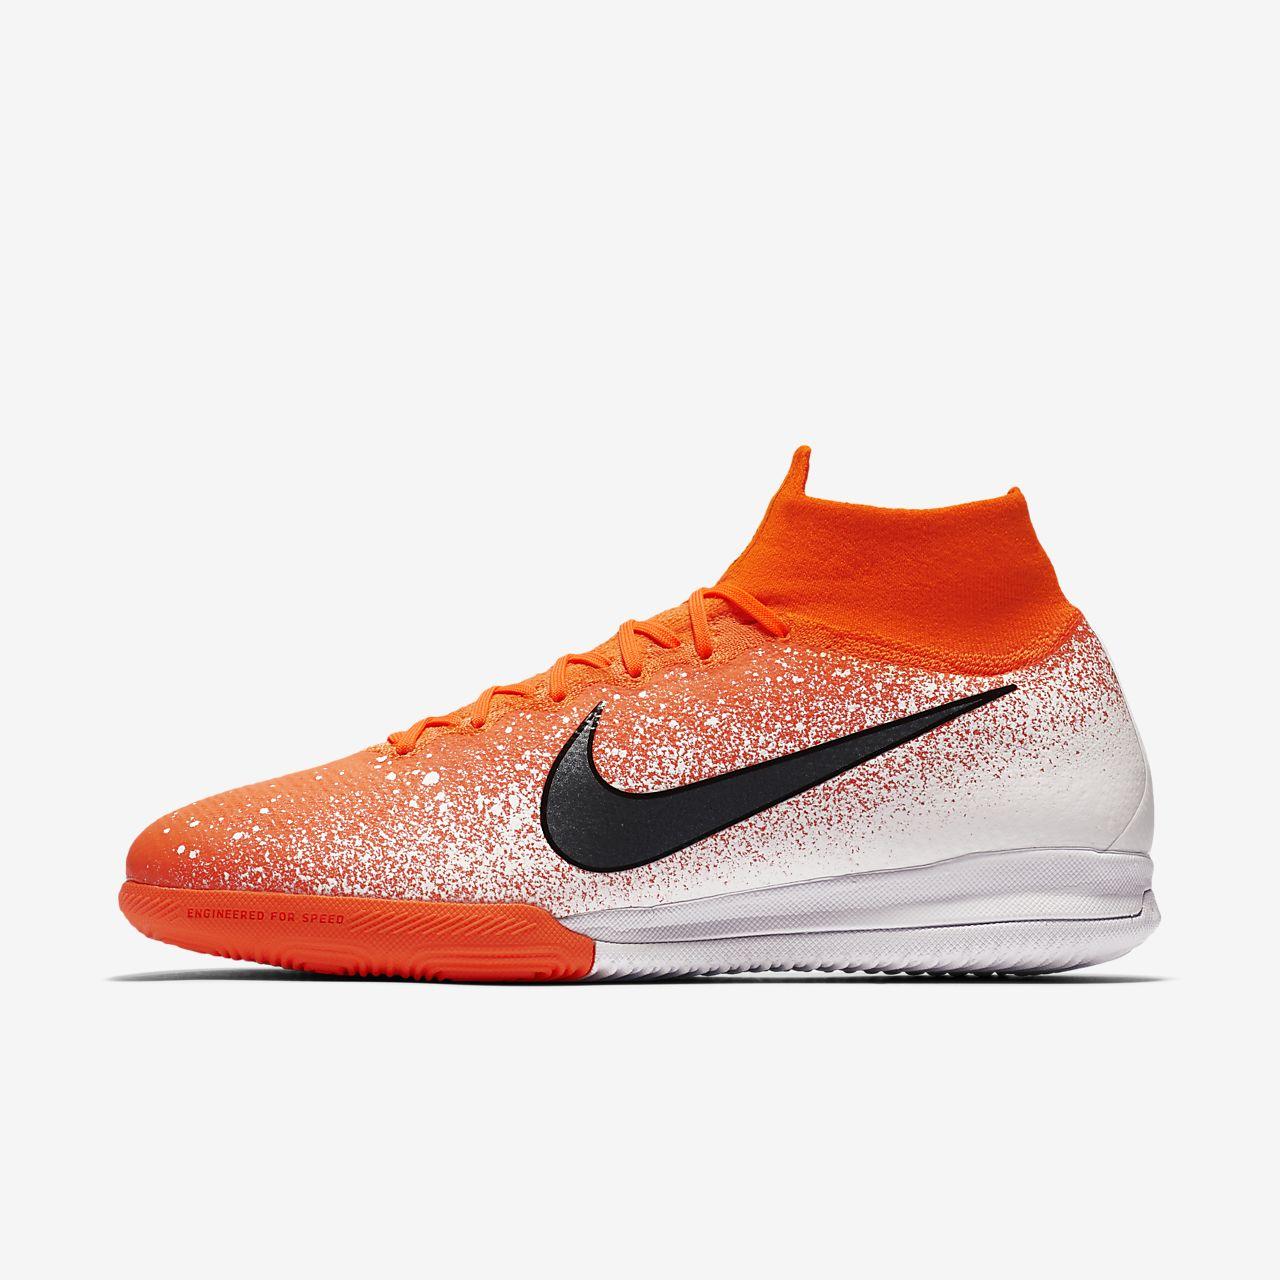 f5e9ef108 Nike SuperflyX 6 Elite IC Men's Indoor/Court Football Boot. Nike.com CA